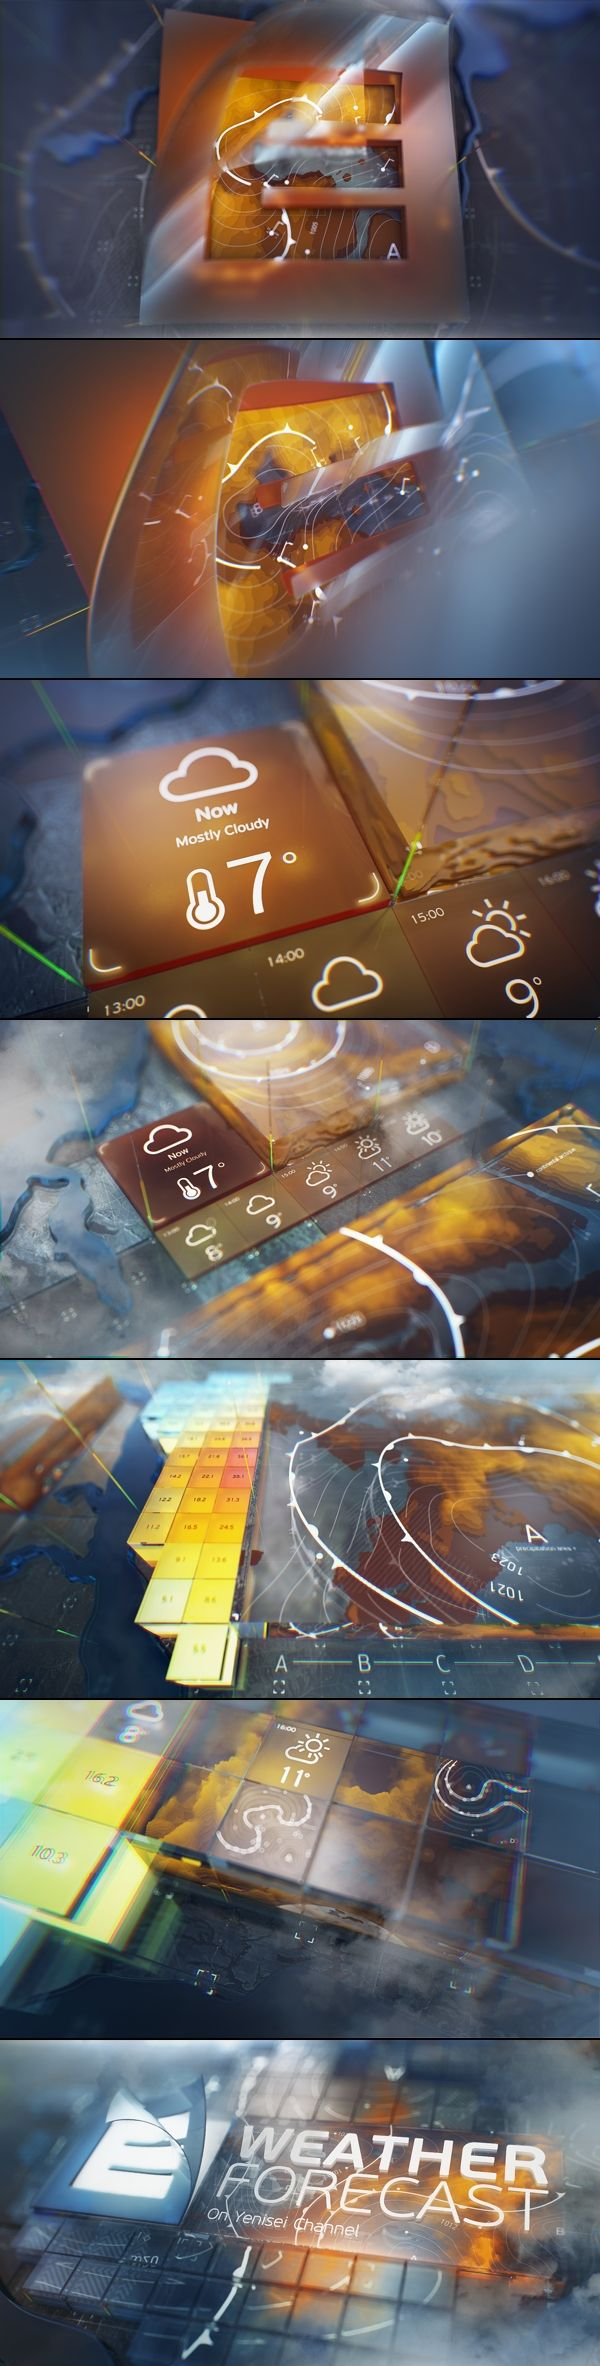 yenisei. weather forecast id. by Serge Aleynikov, via Behance